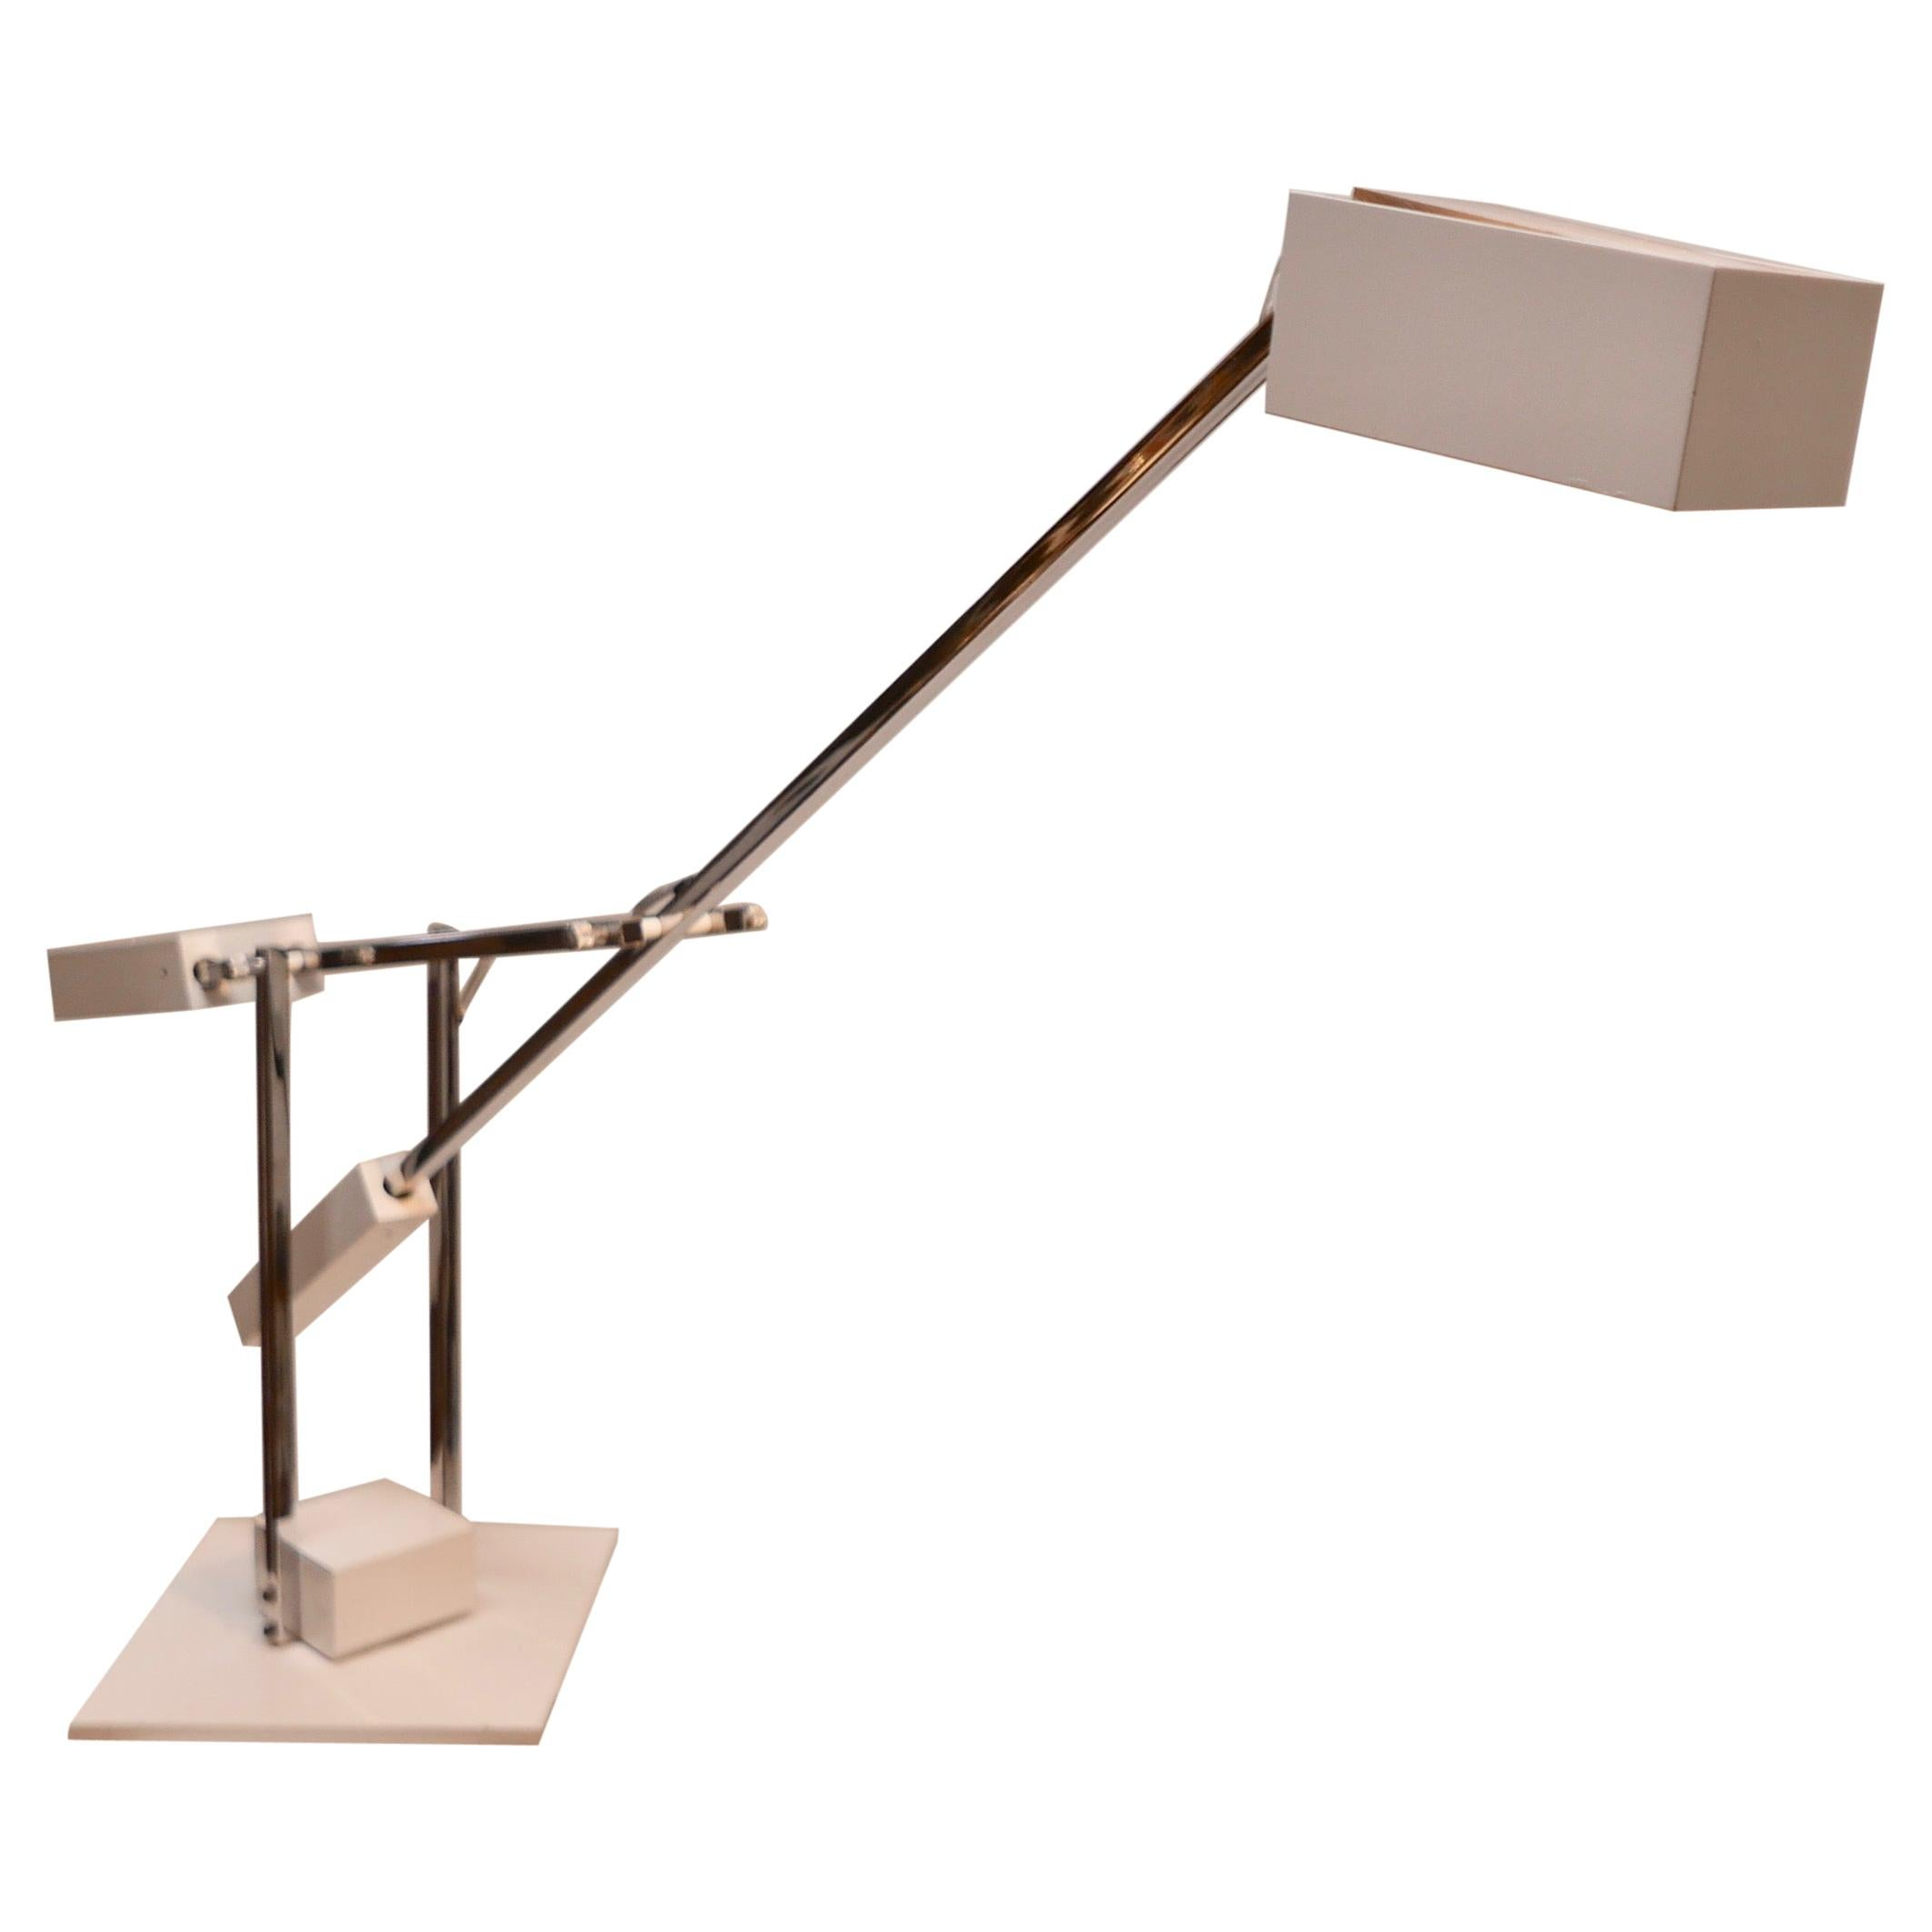 Chrome and White Metal Minimalist Desk Lamp by Designer Robert Sonneman, 1970s